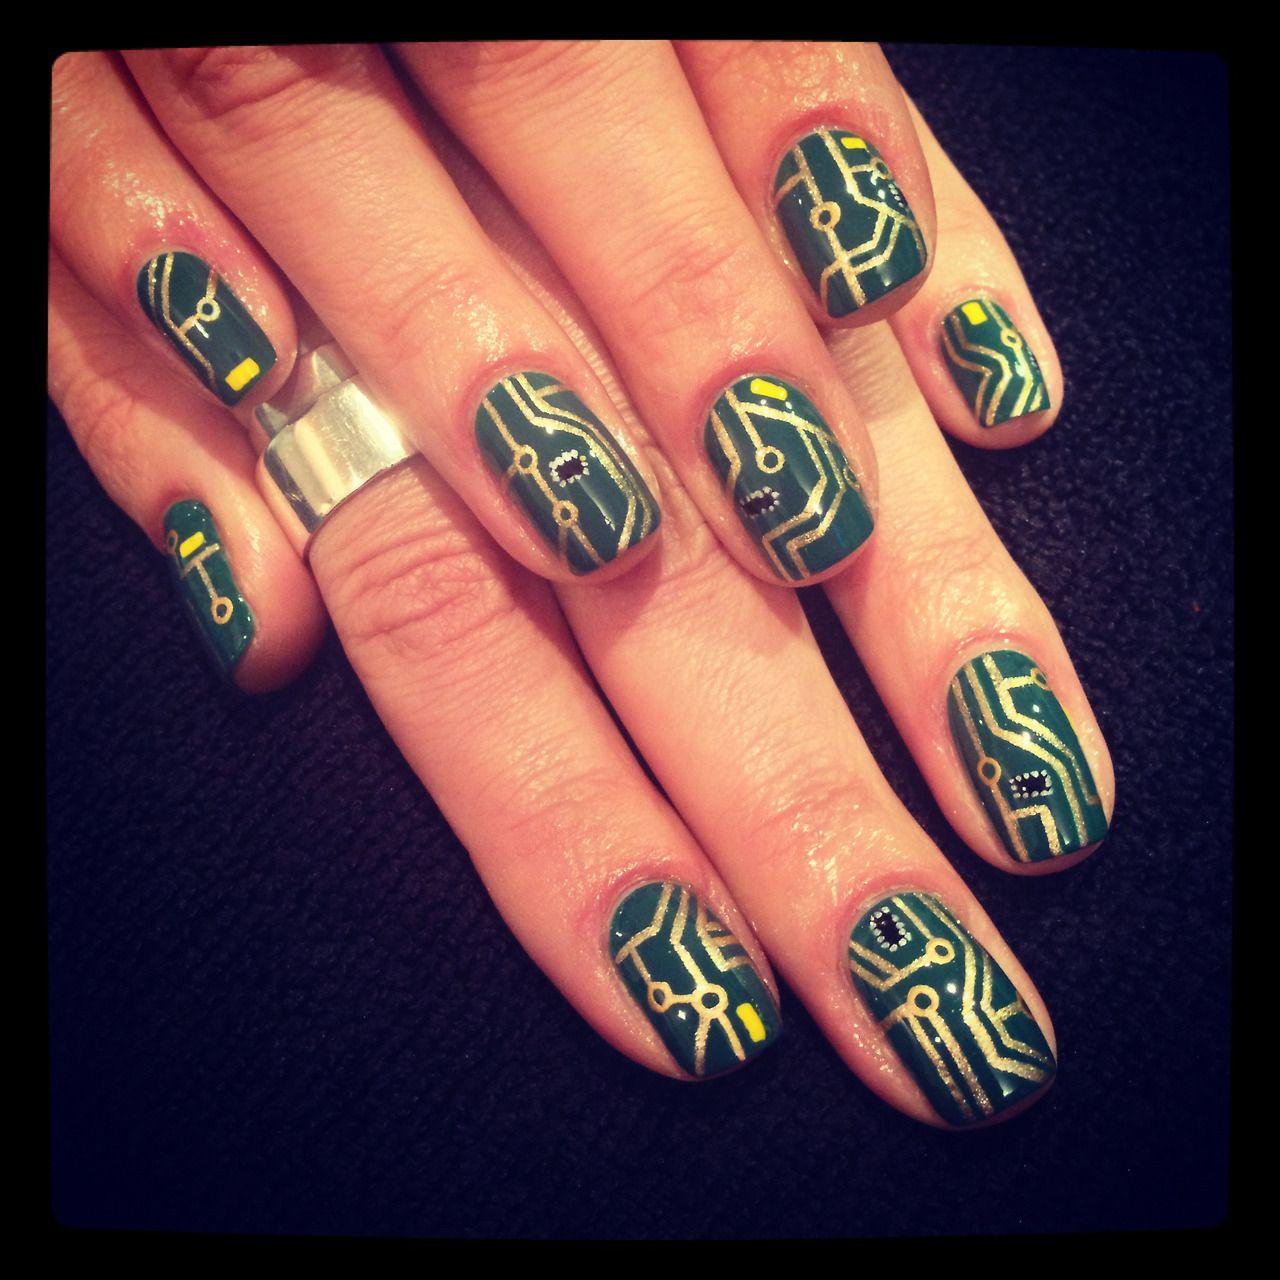 Short circuit nails by the illustrated nail | Nails | Pinterest ...